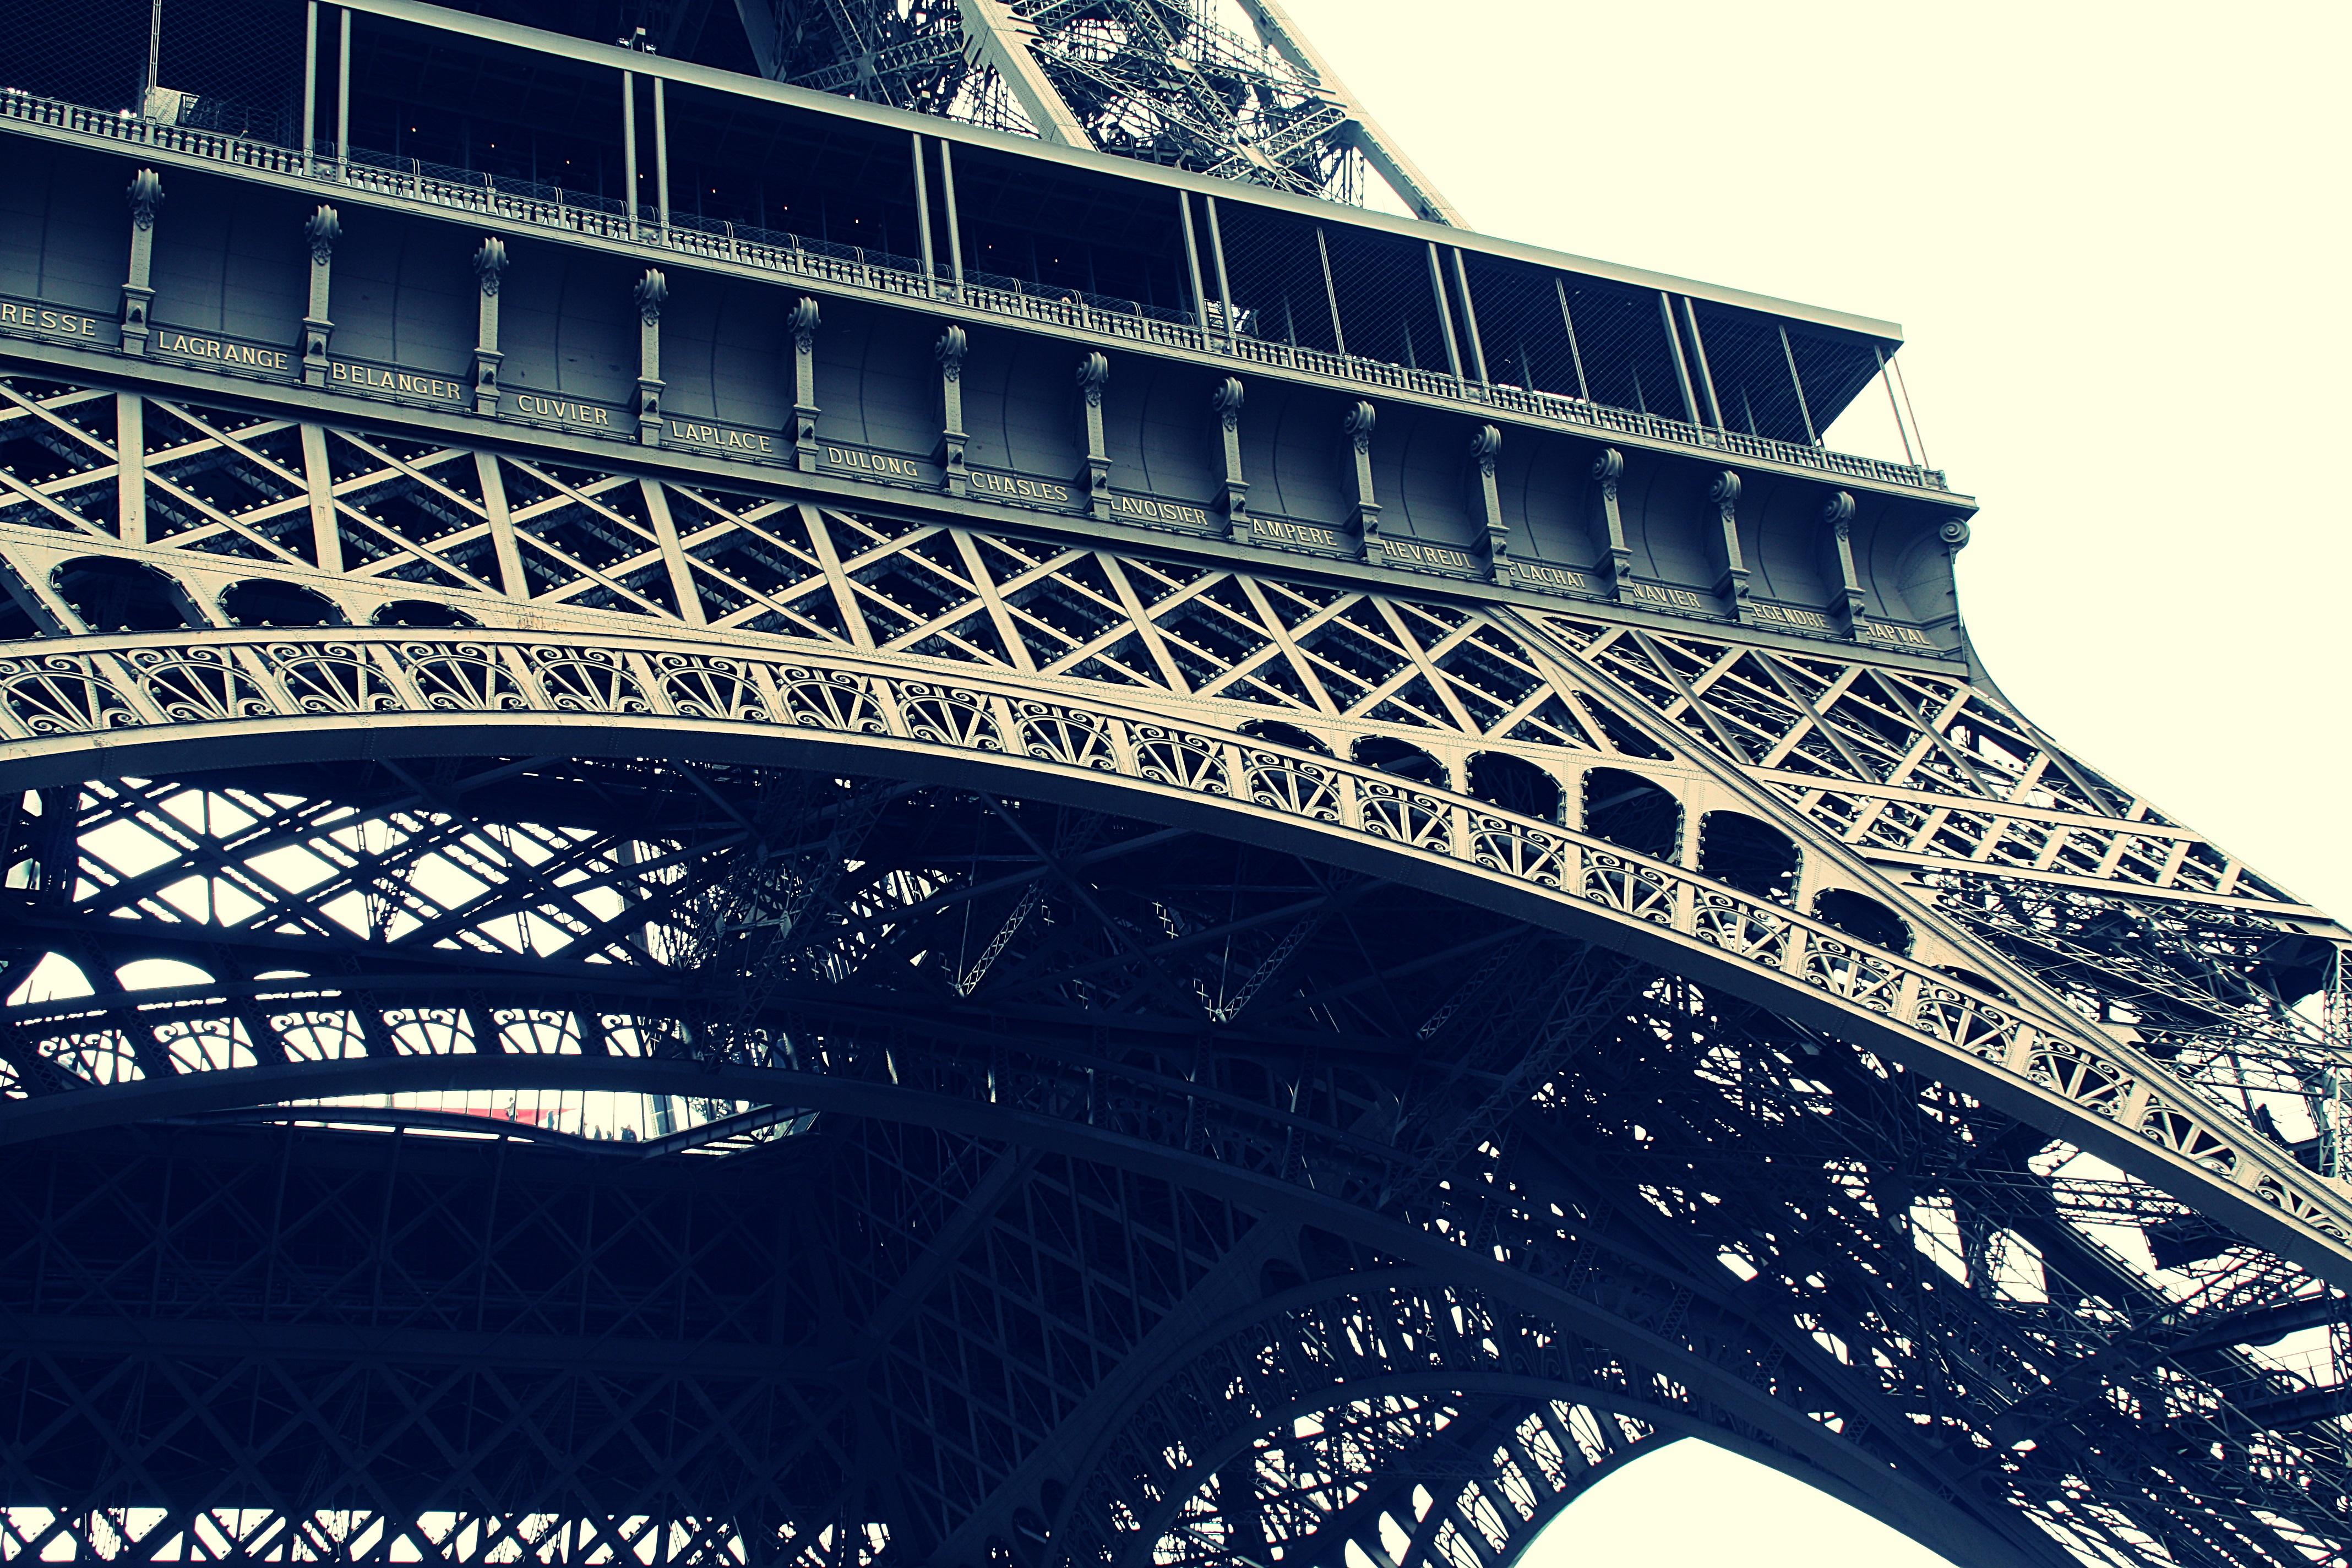 Wallpaper 3d Free Download Pc Eiffel Tower 183 Free Stock Photo